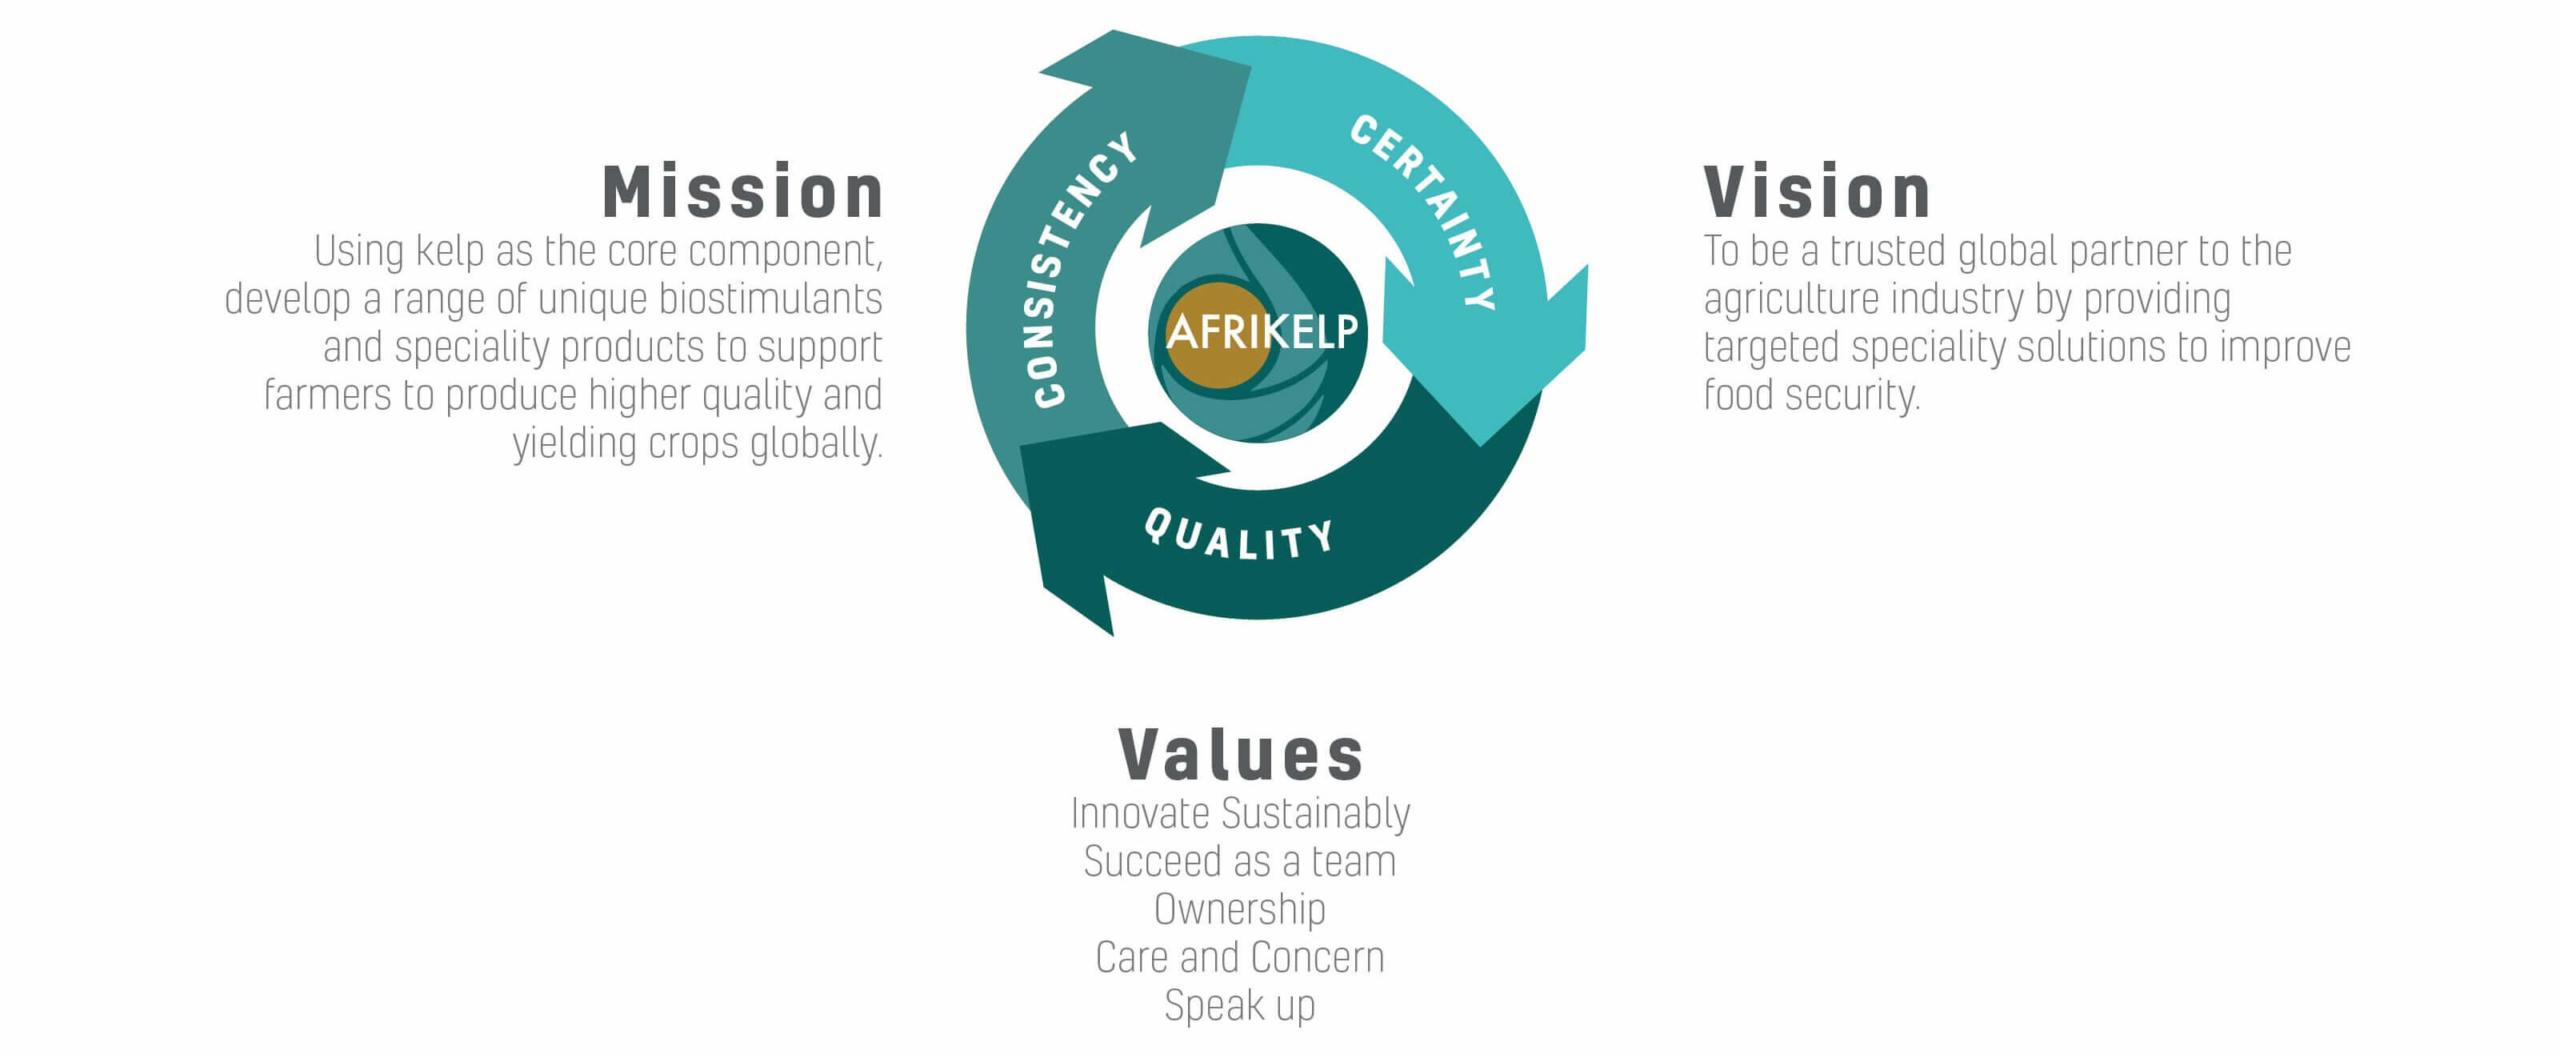 Afrikelp Vision Mission Values